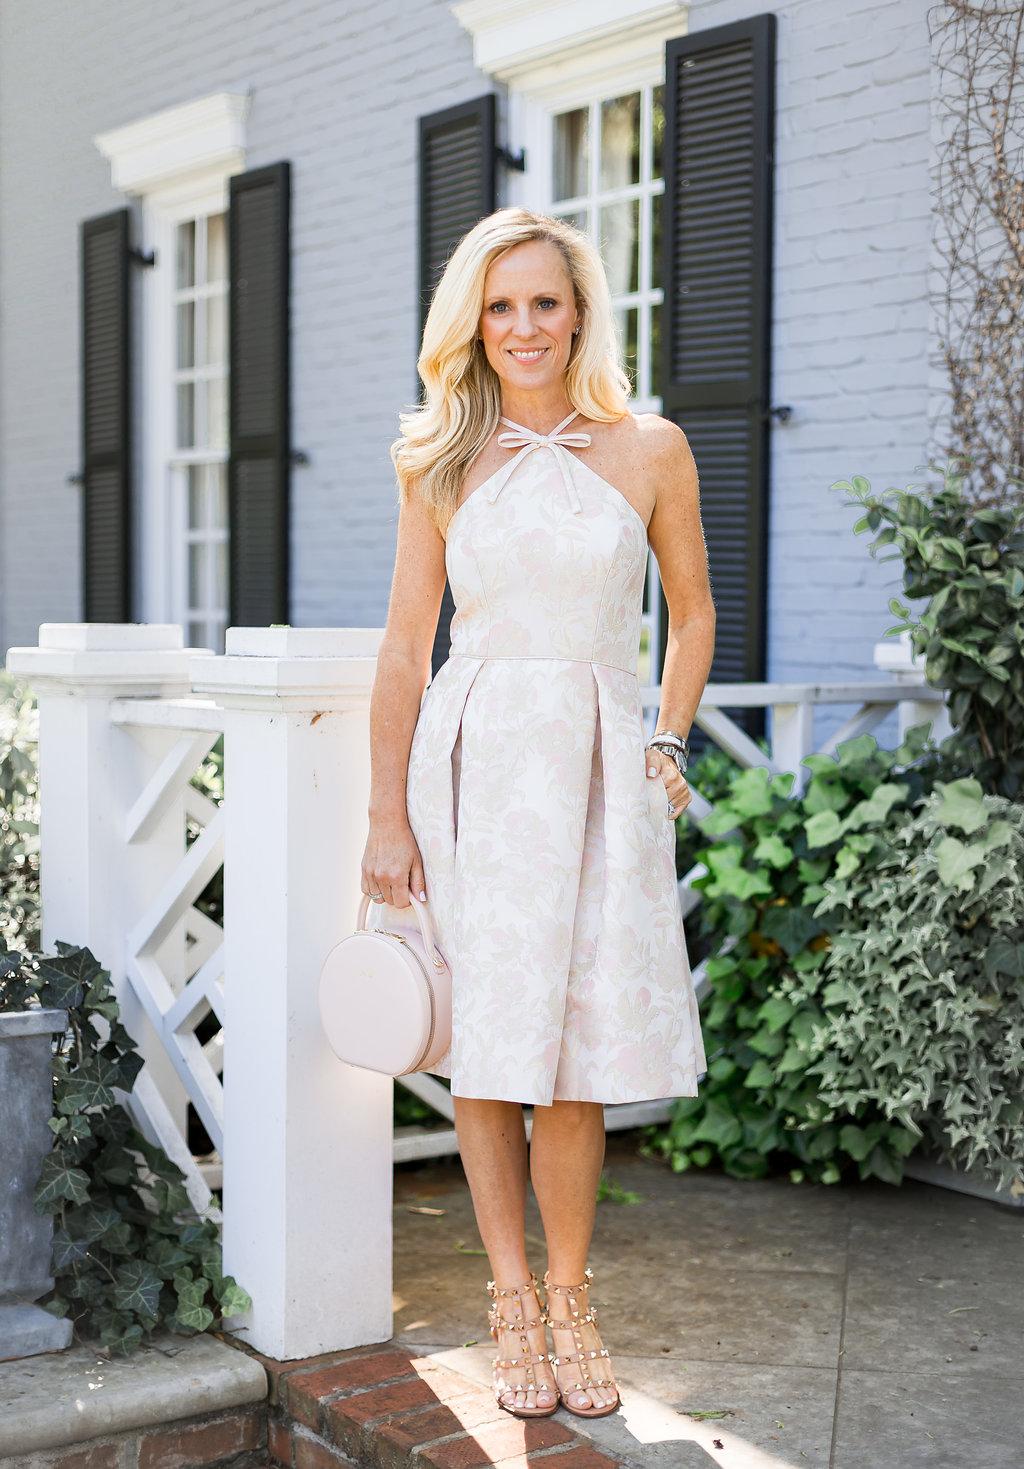 Alicia Wood, Dallas Fashion Blogger, Dallas Lifestyle Blogger, Gal Meets Glam Evelyn Dress, Julia Hengle, The Daily Edited Circle Bag,